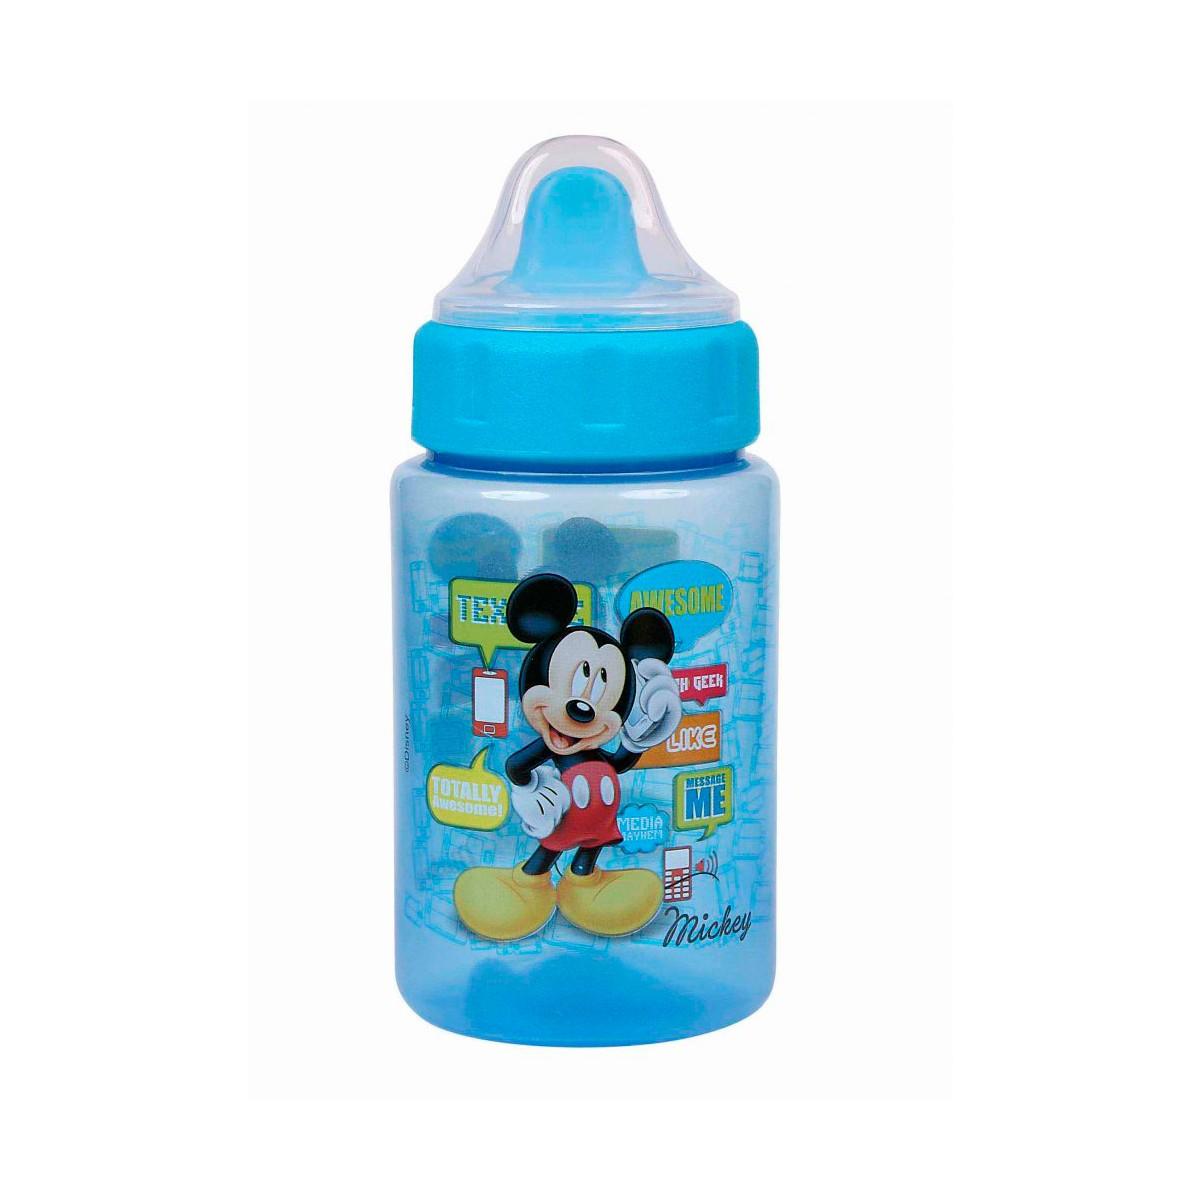 Copo C/ Redutor De Pingos + Tampa Mickey BabyGo Premium